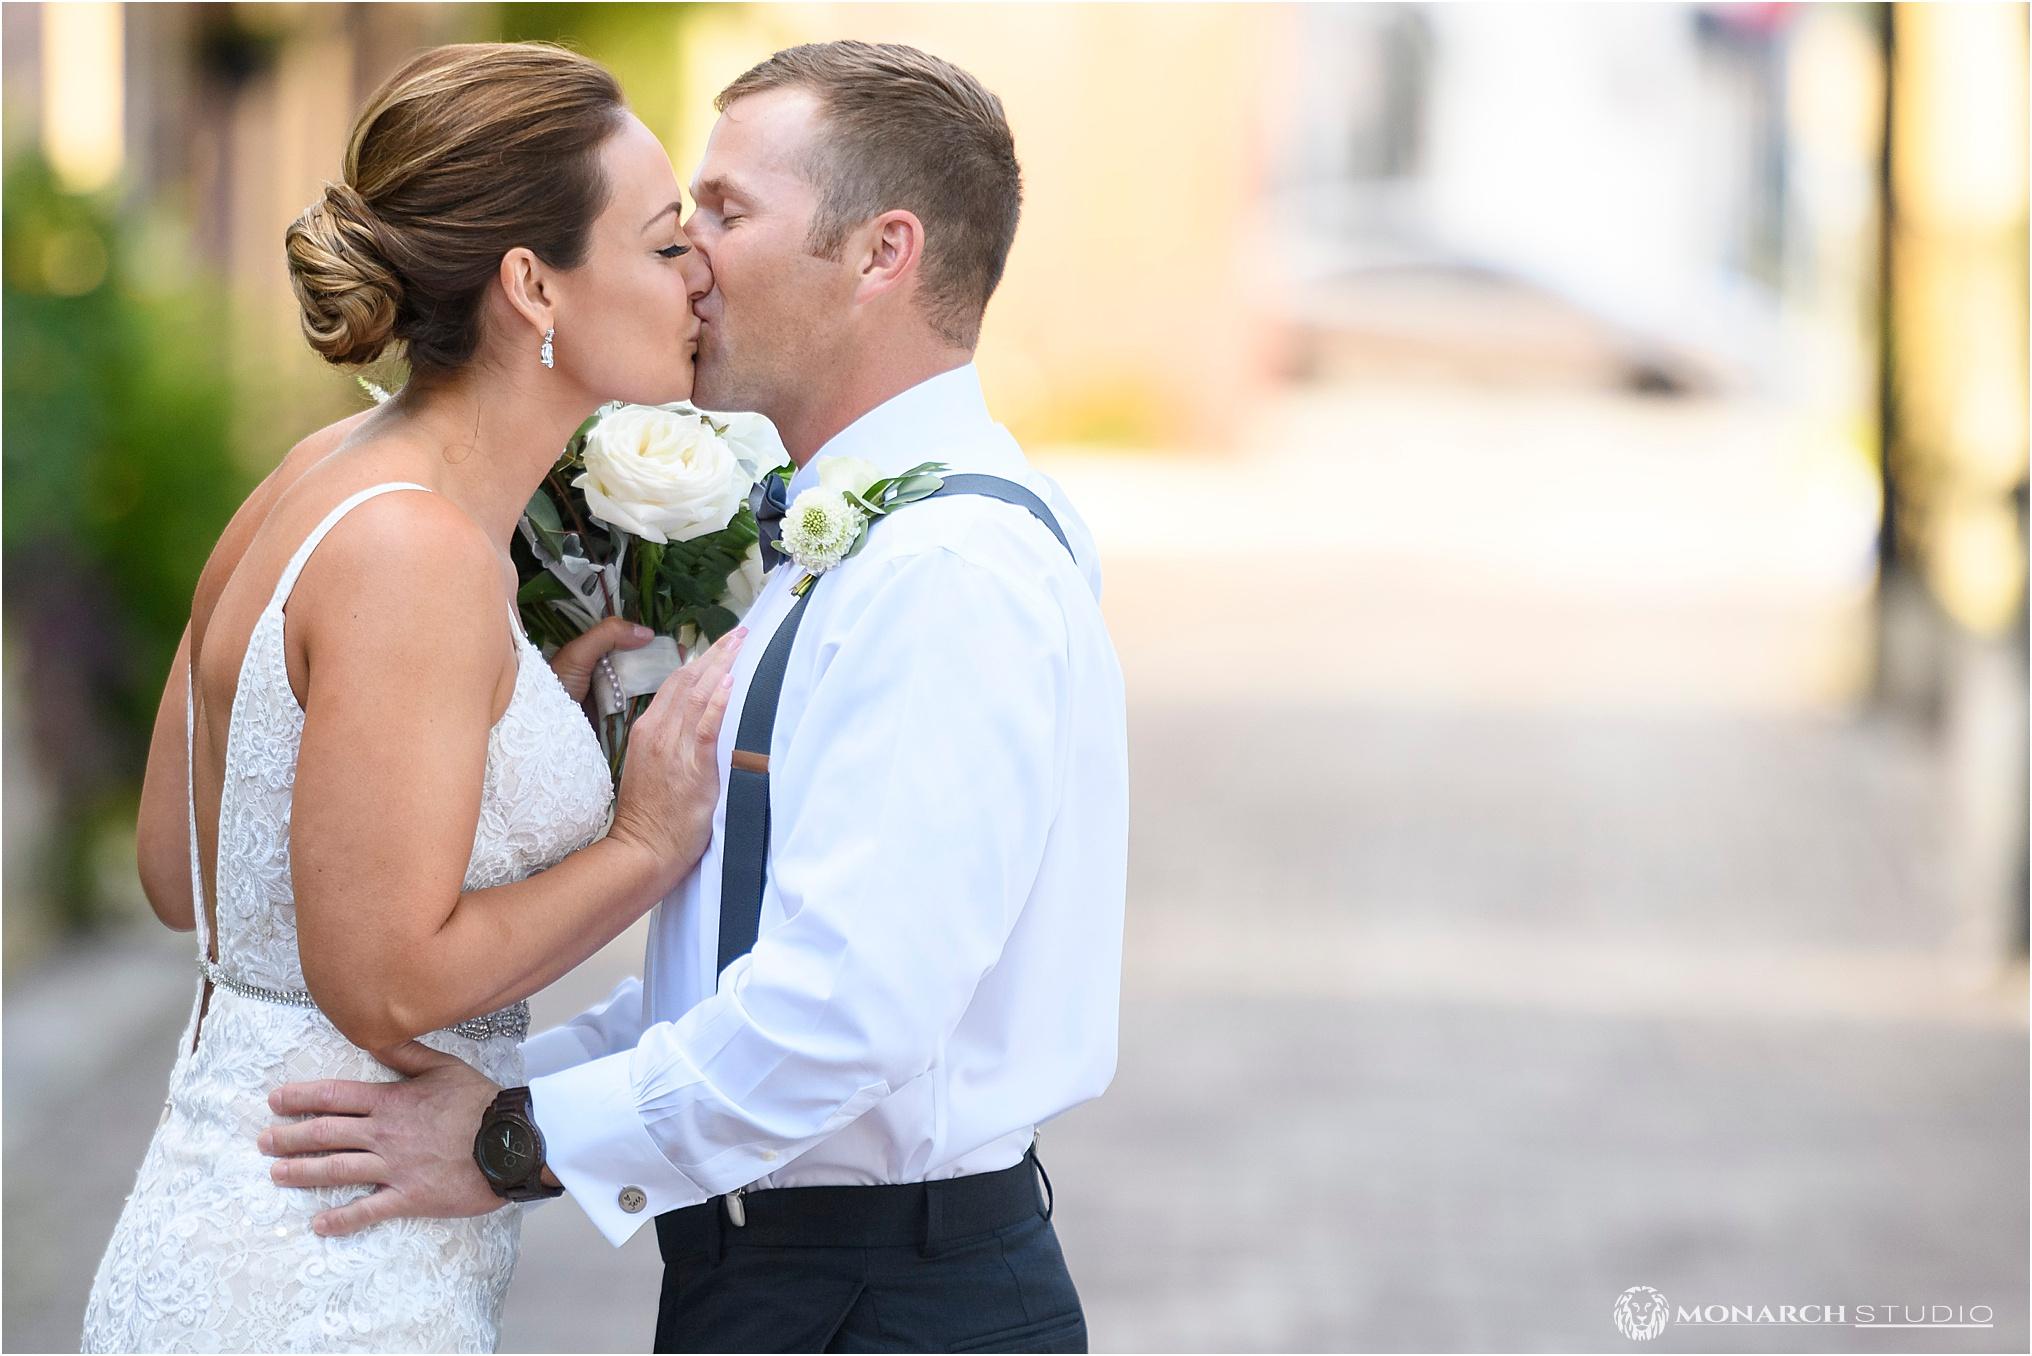 041-whiteroom-wedding-photographer-2019-05-22_0023.jpg